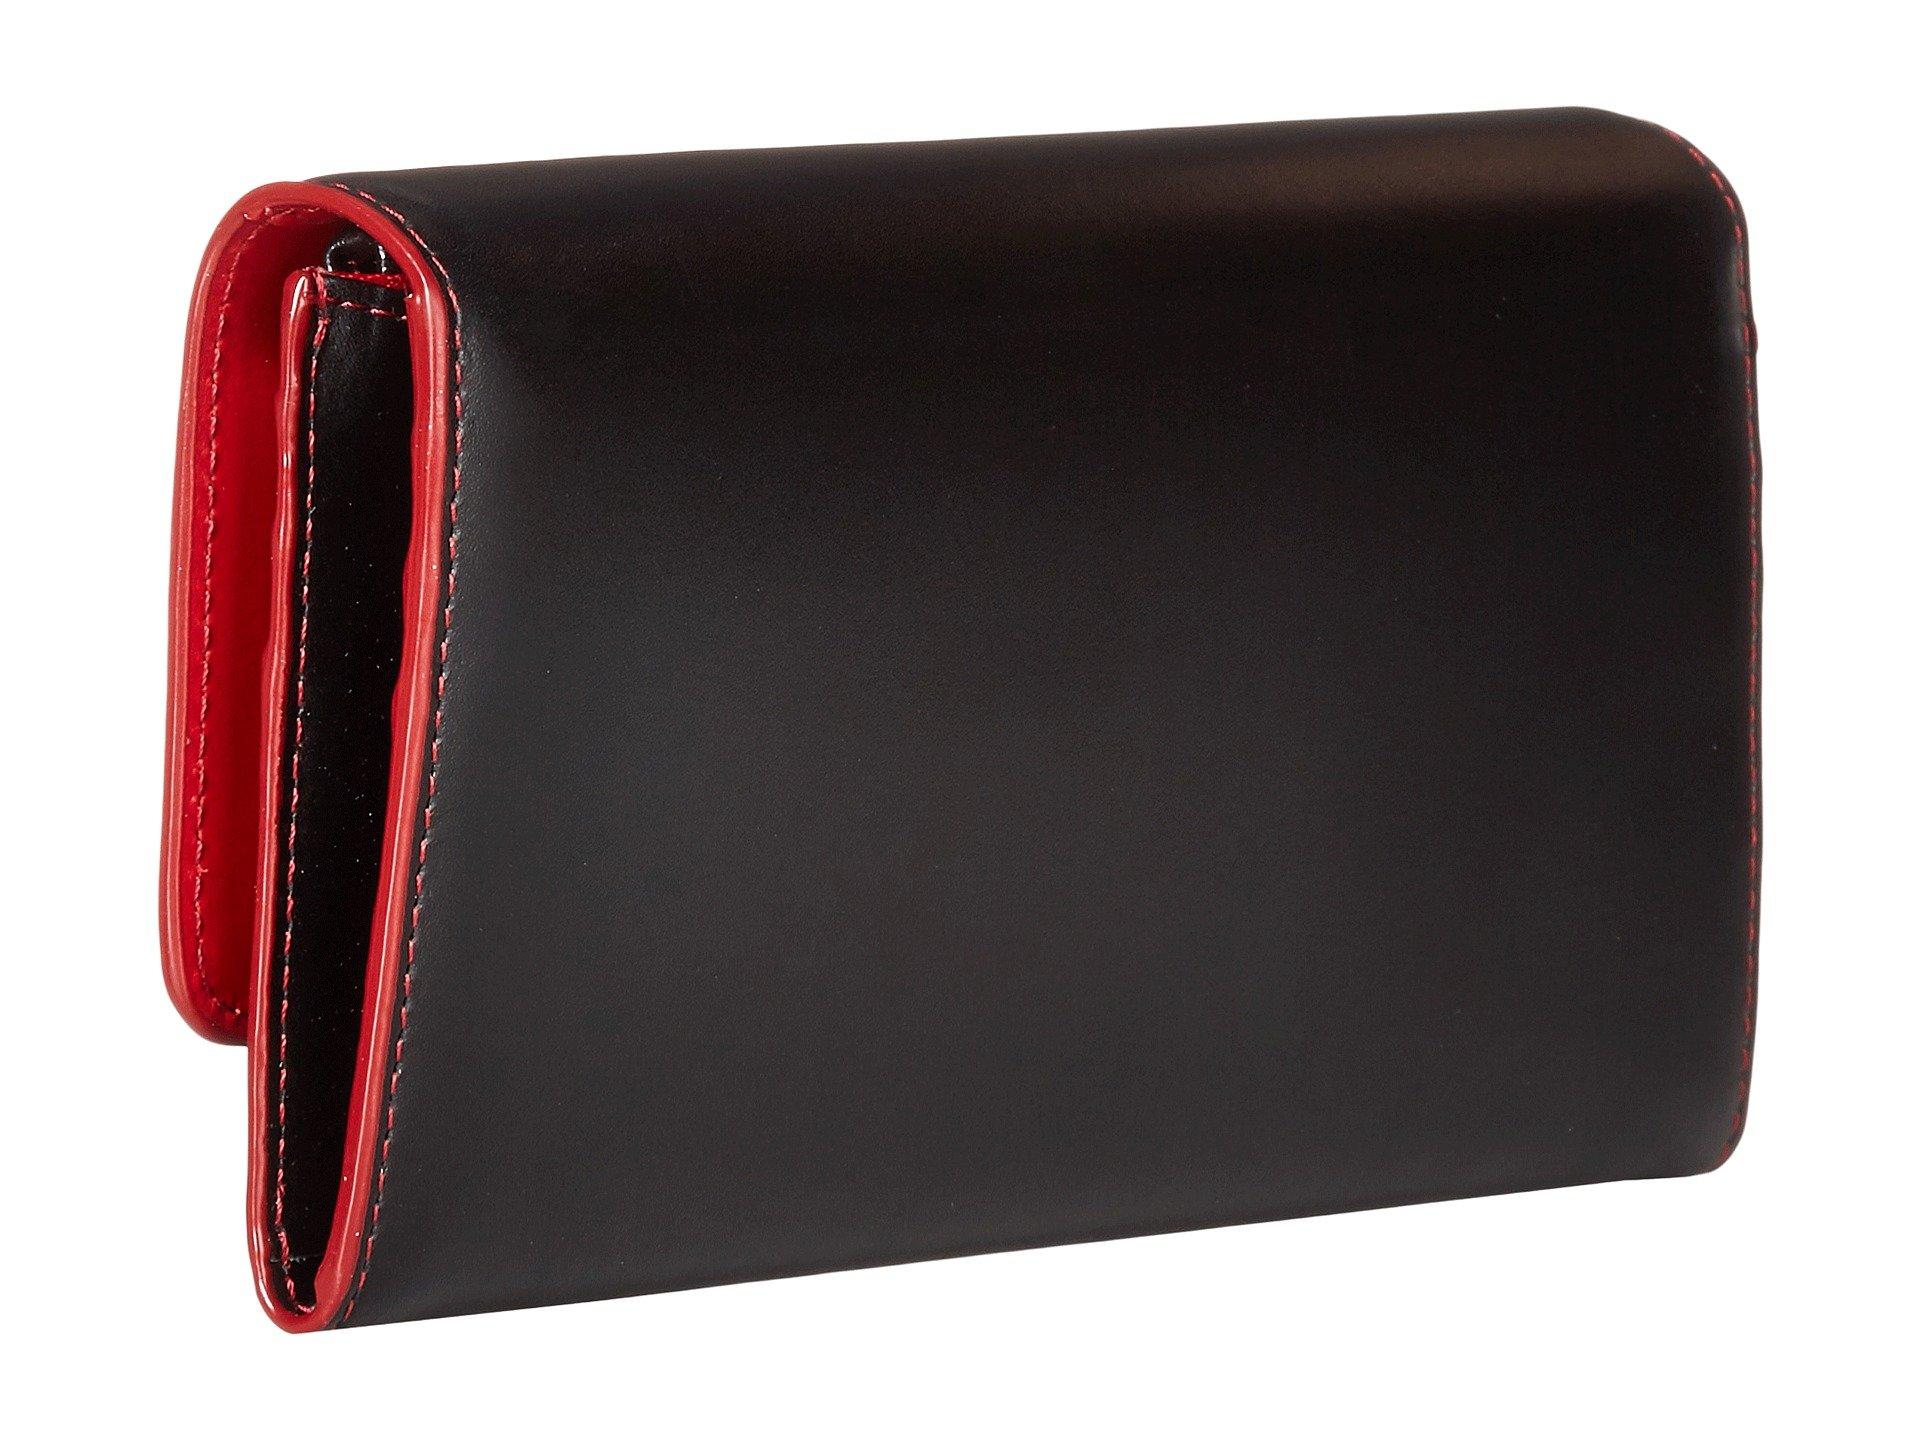 Wallet Accessories Luna Black Lodis Audrey Lock Key Under Clutch amp; Rfid ATqTzw